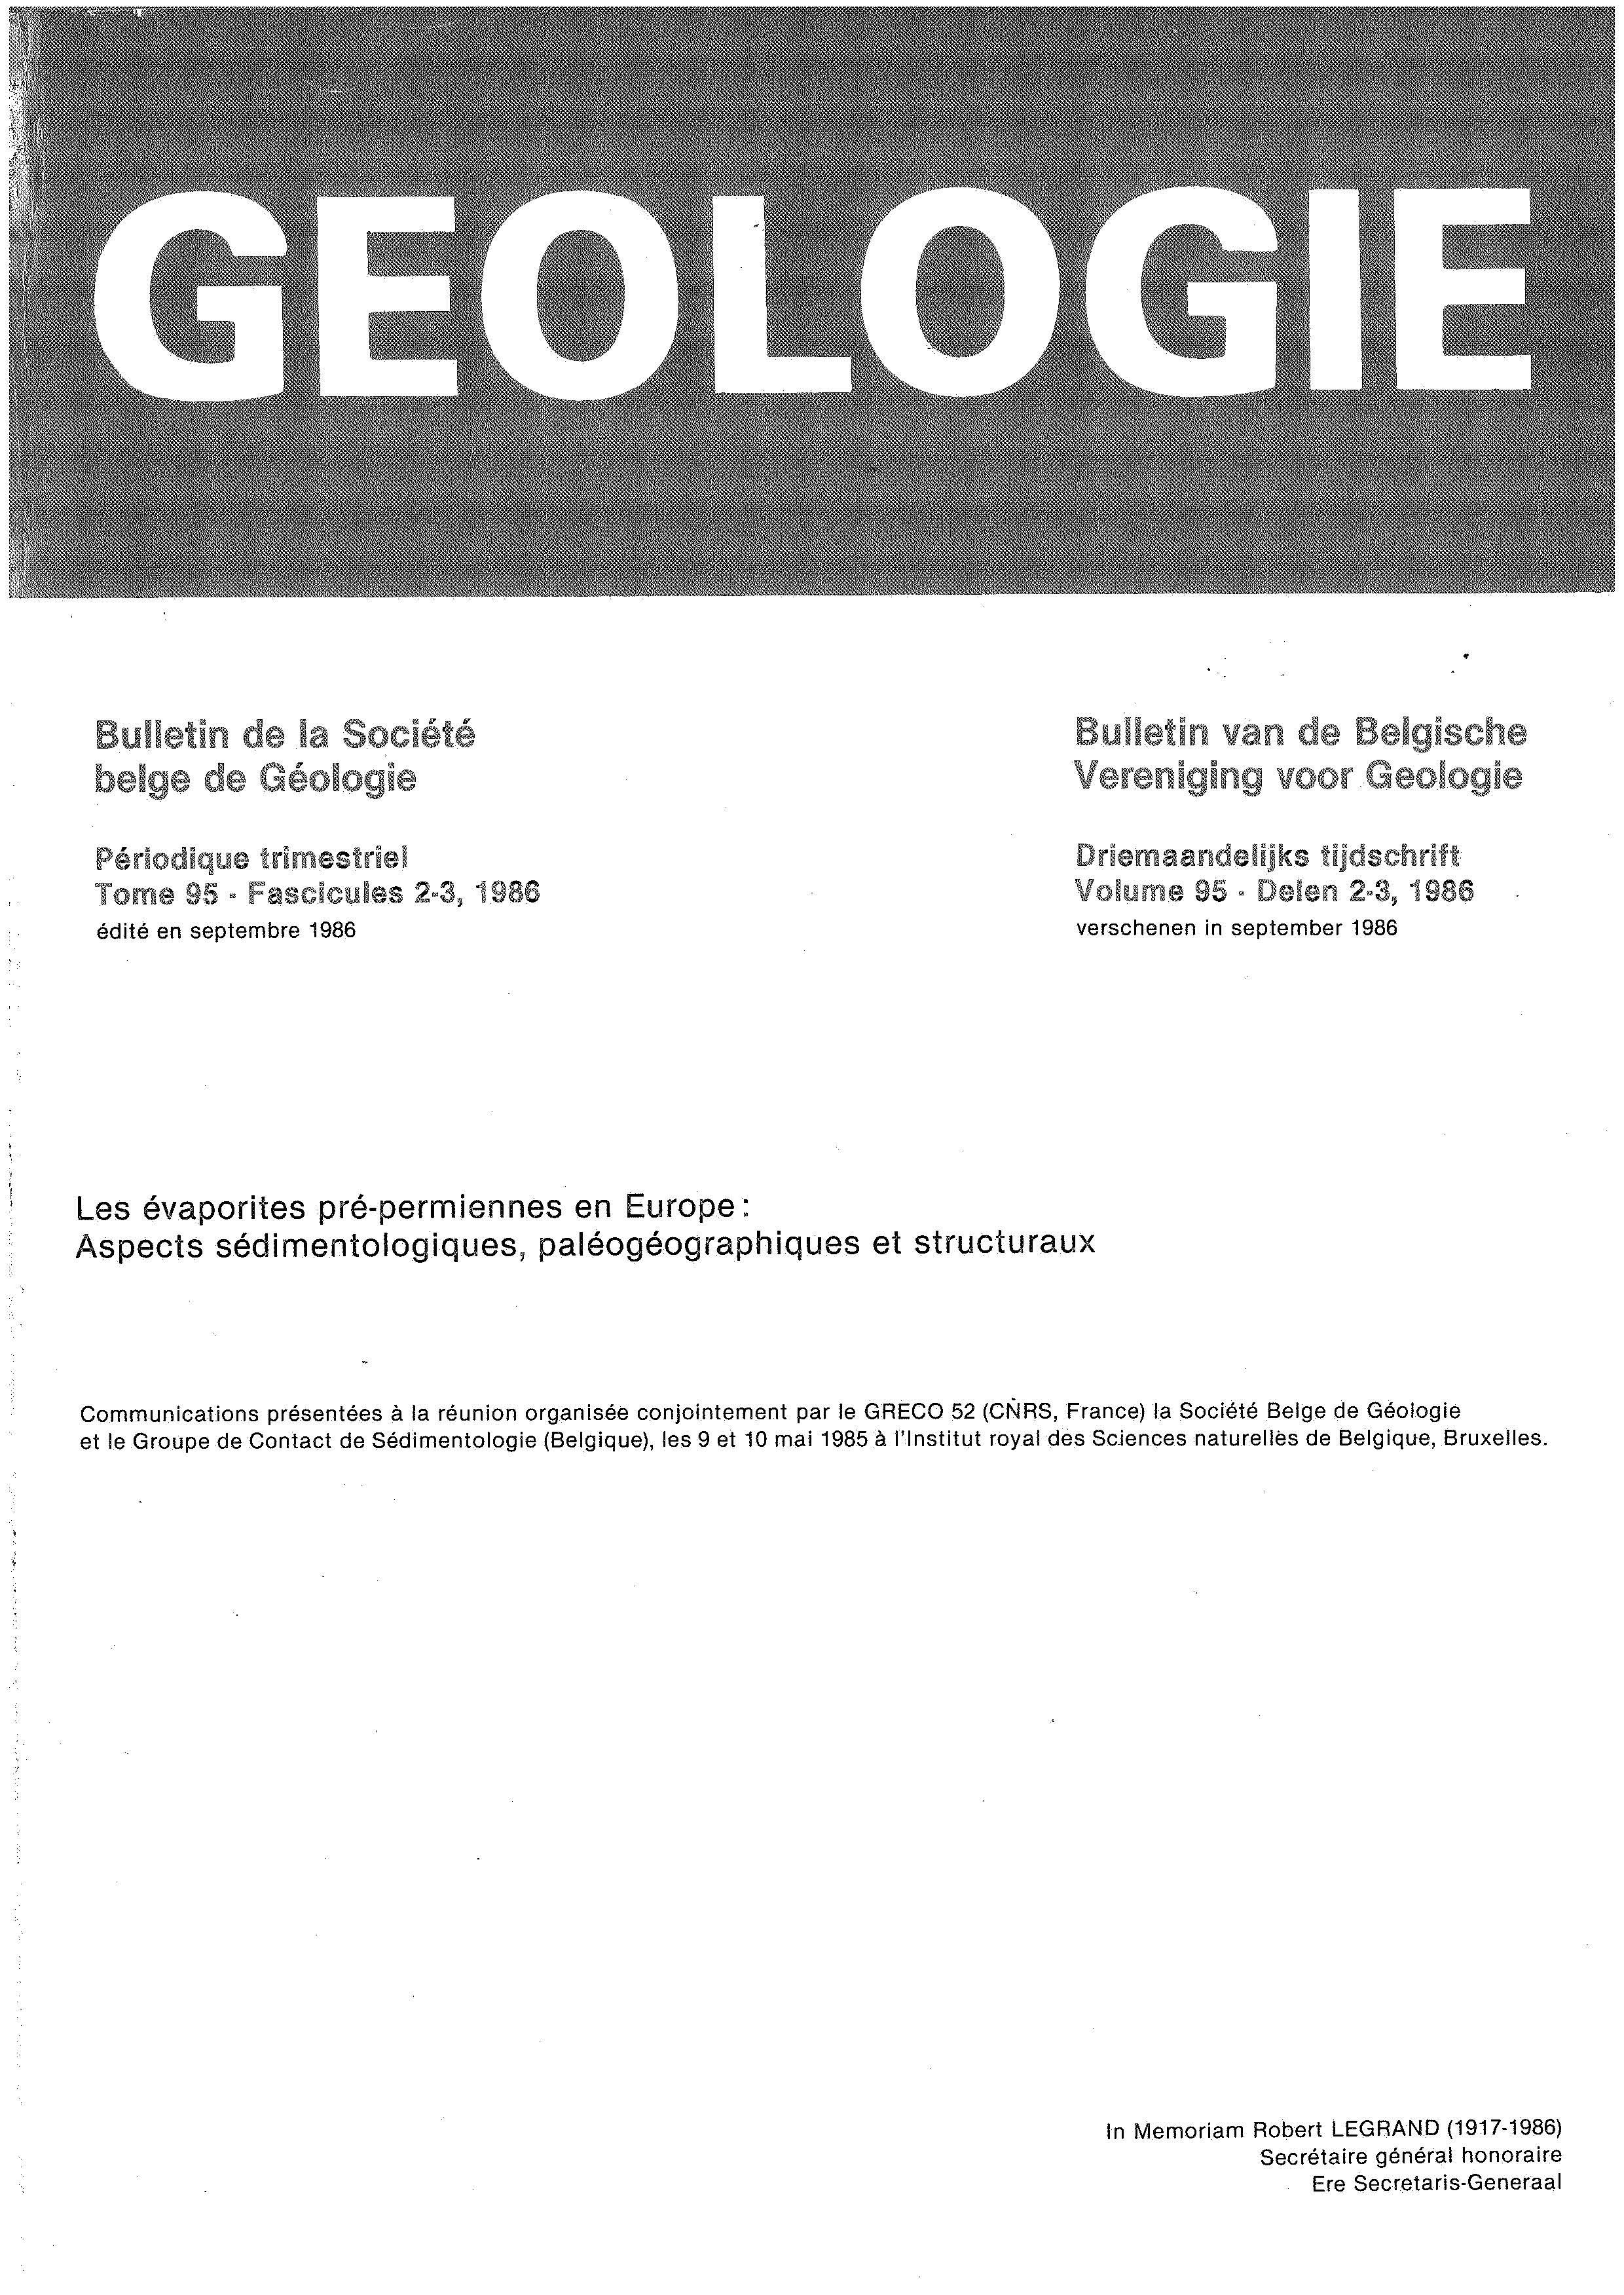 BSBG_95_1986_2-3.jpg